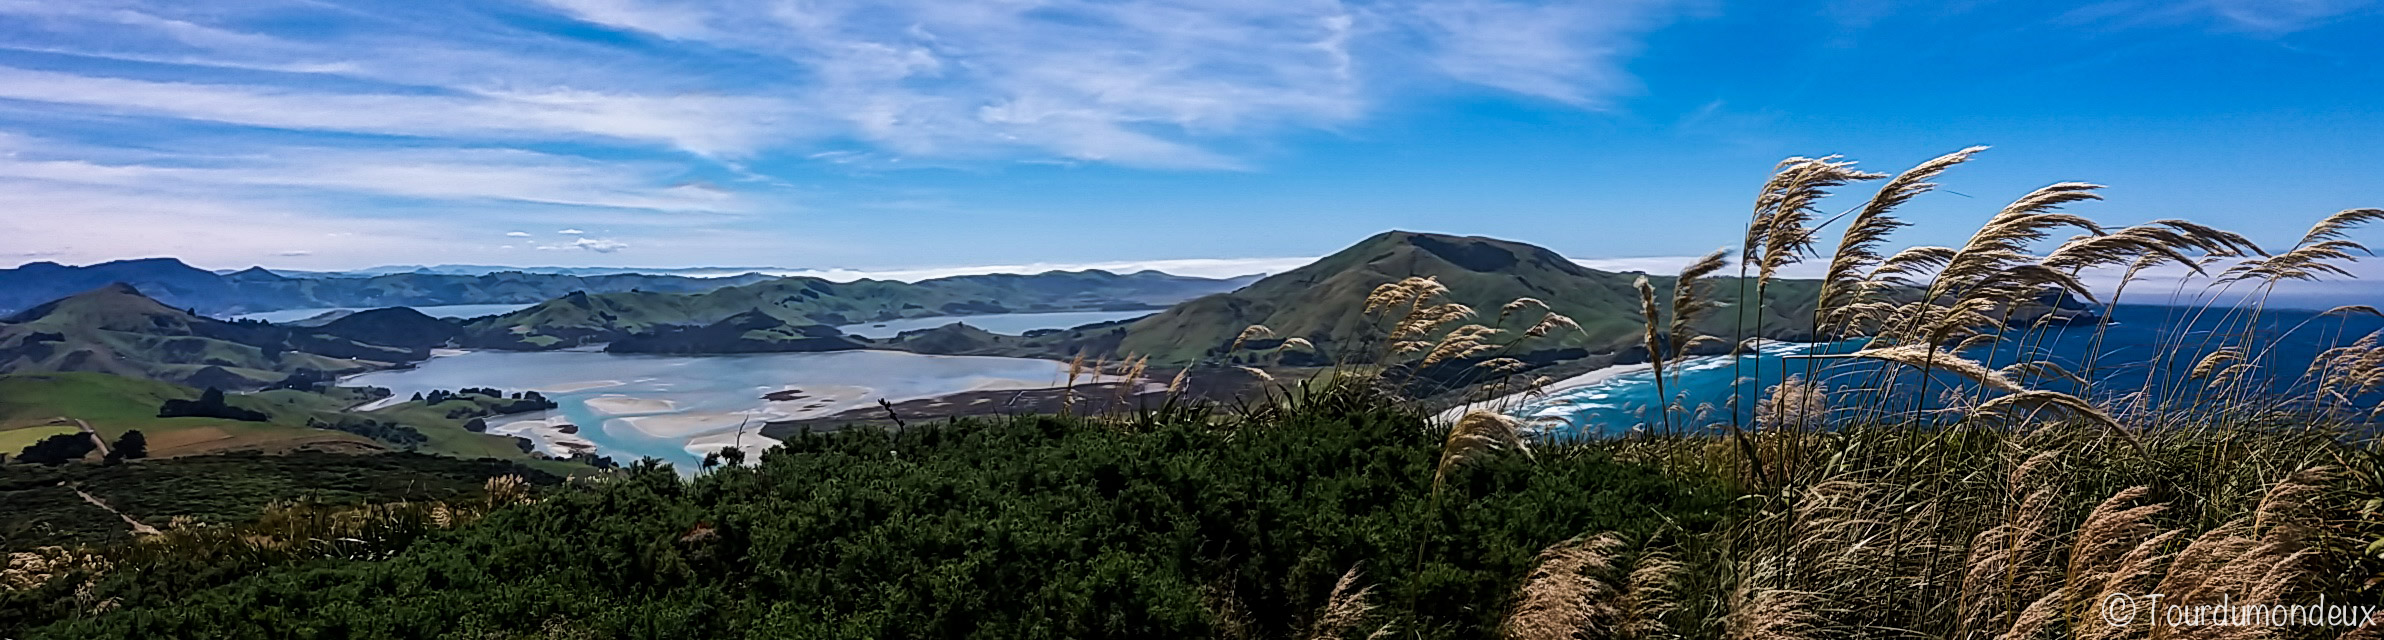 sandymount-panorama-nouvelle-zelande